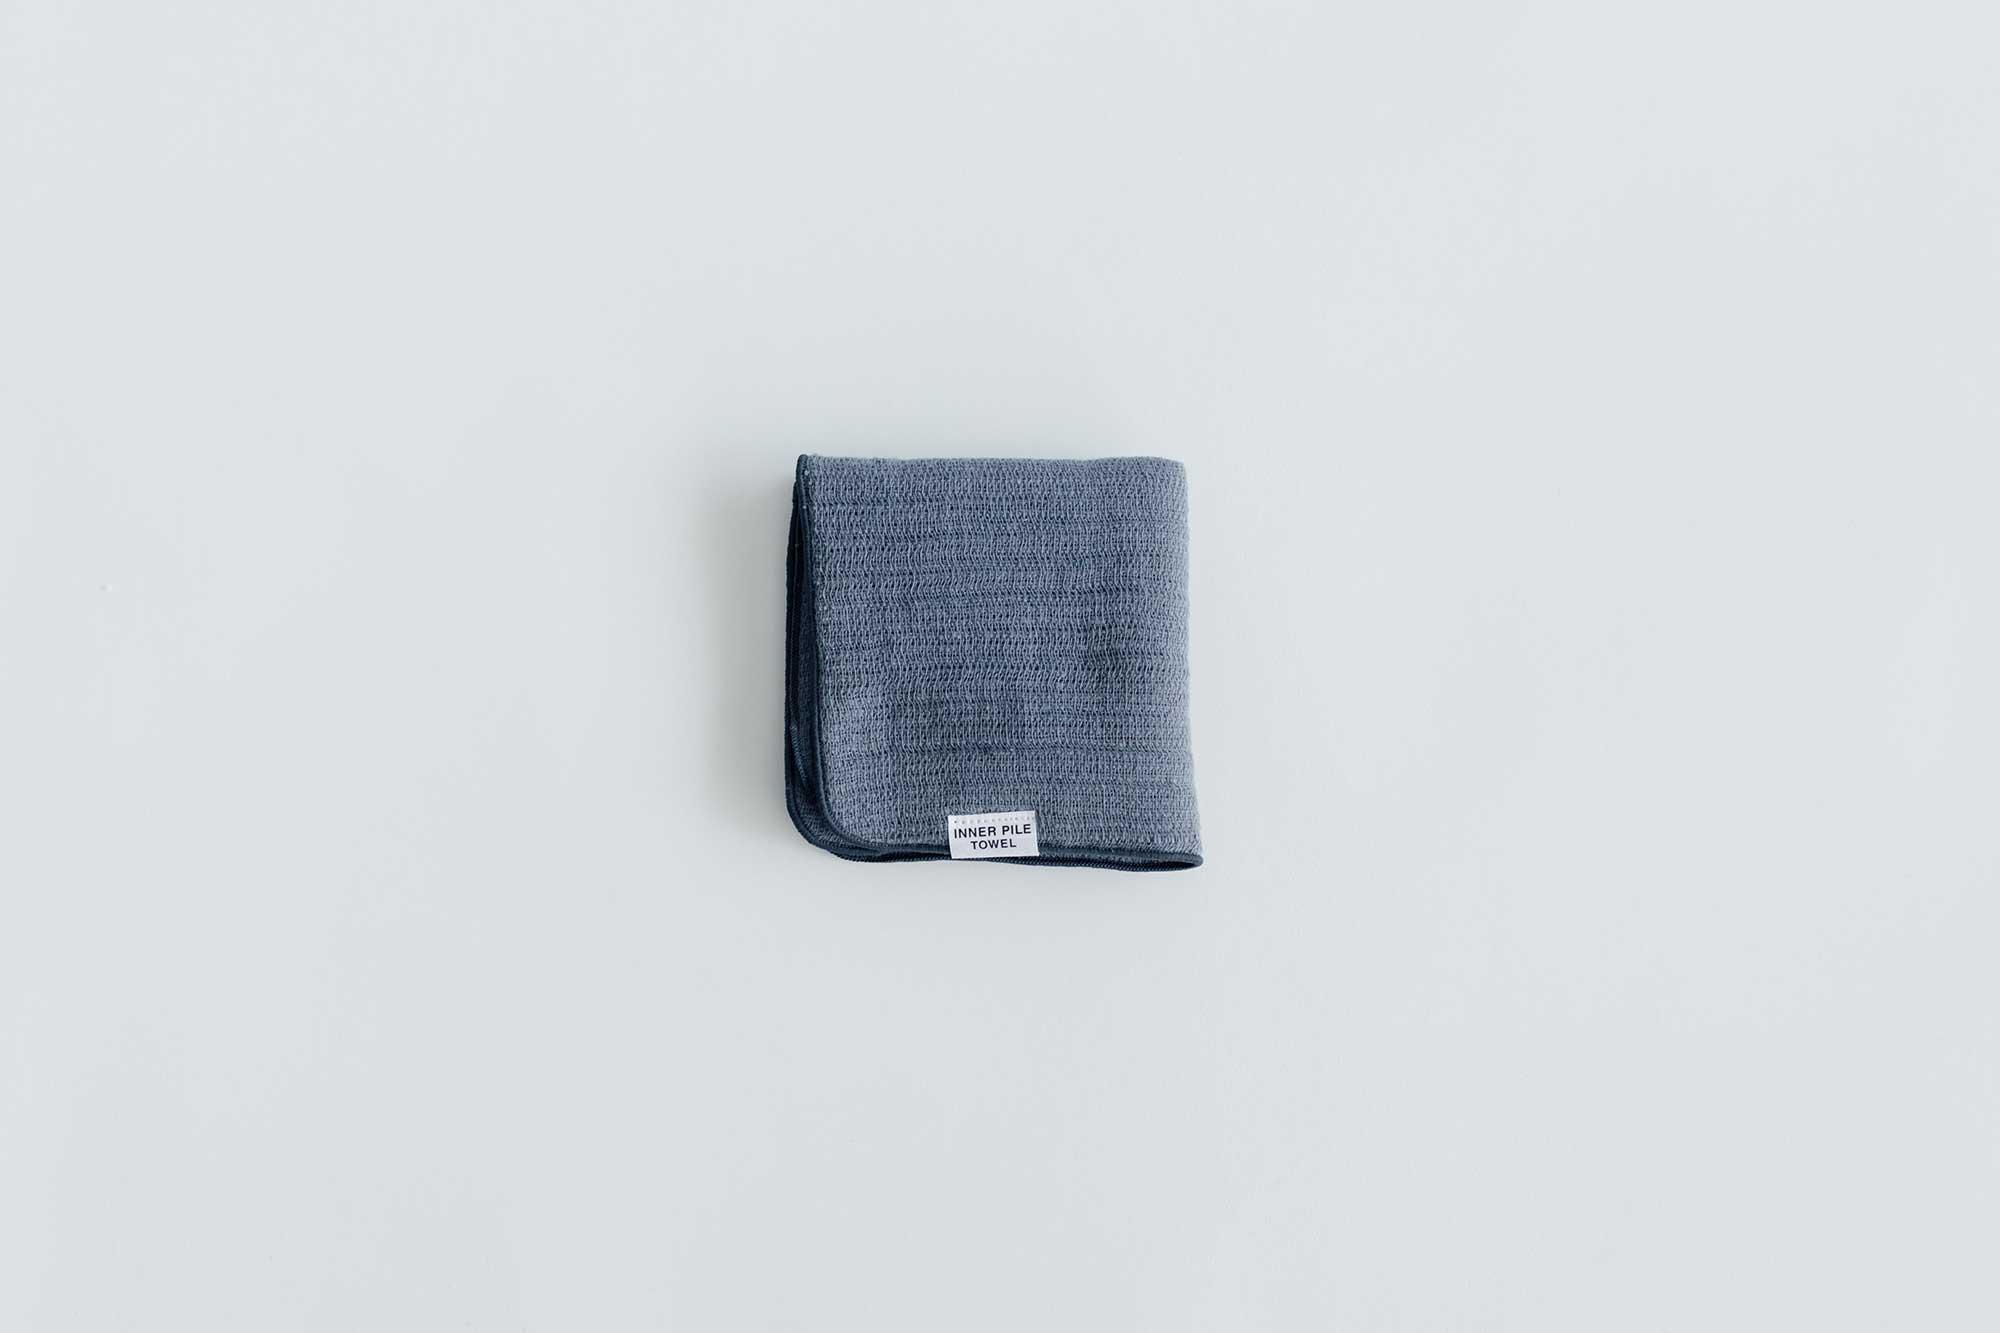 SHINTO TOWEL INNER PILE ミニタオル / プレゼントパッケージ